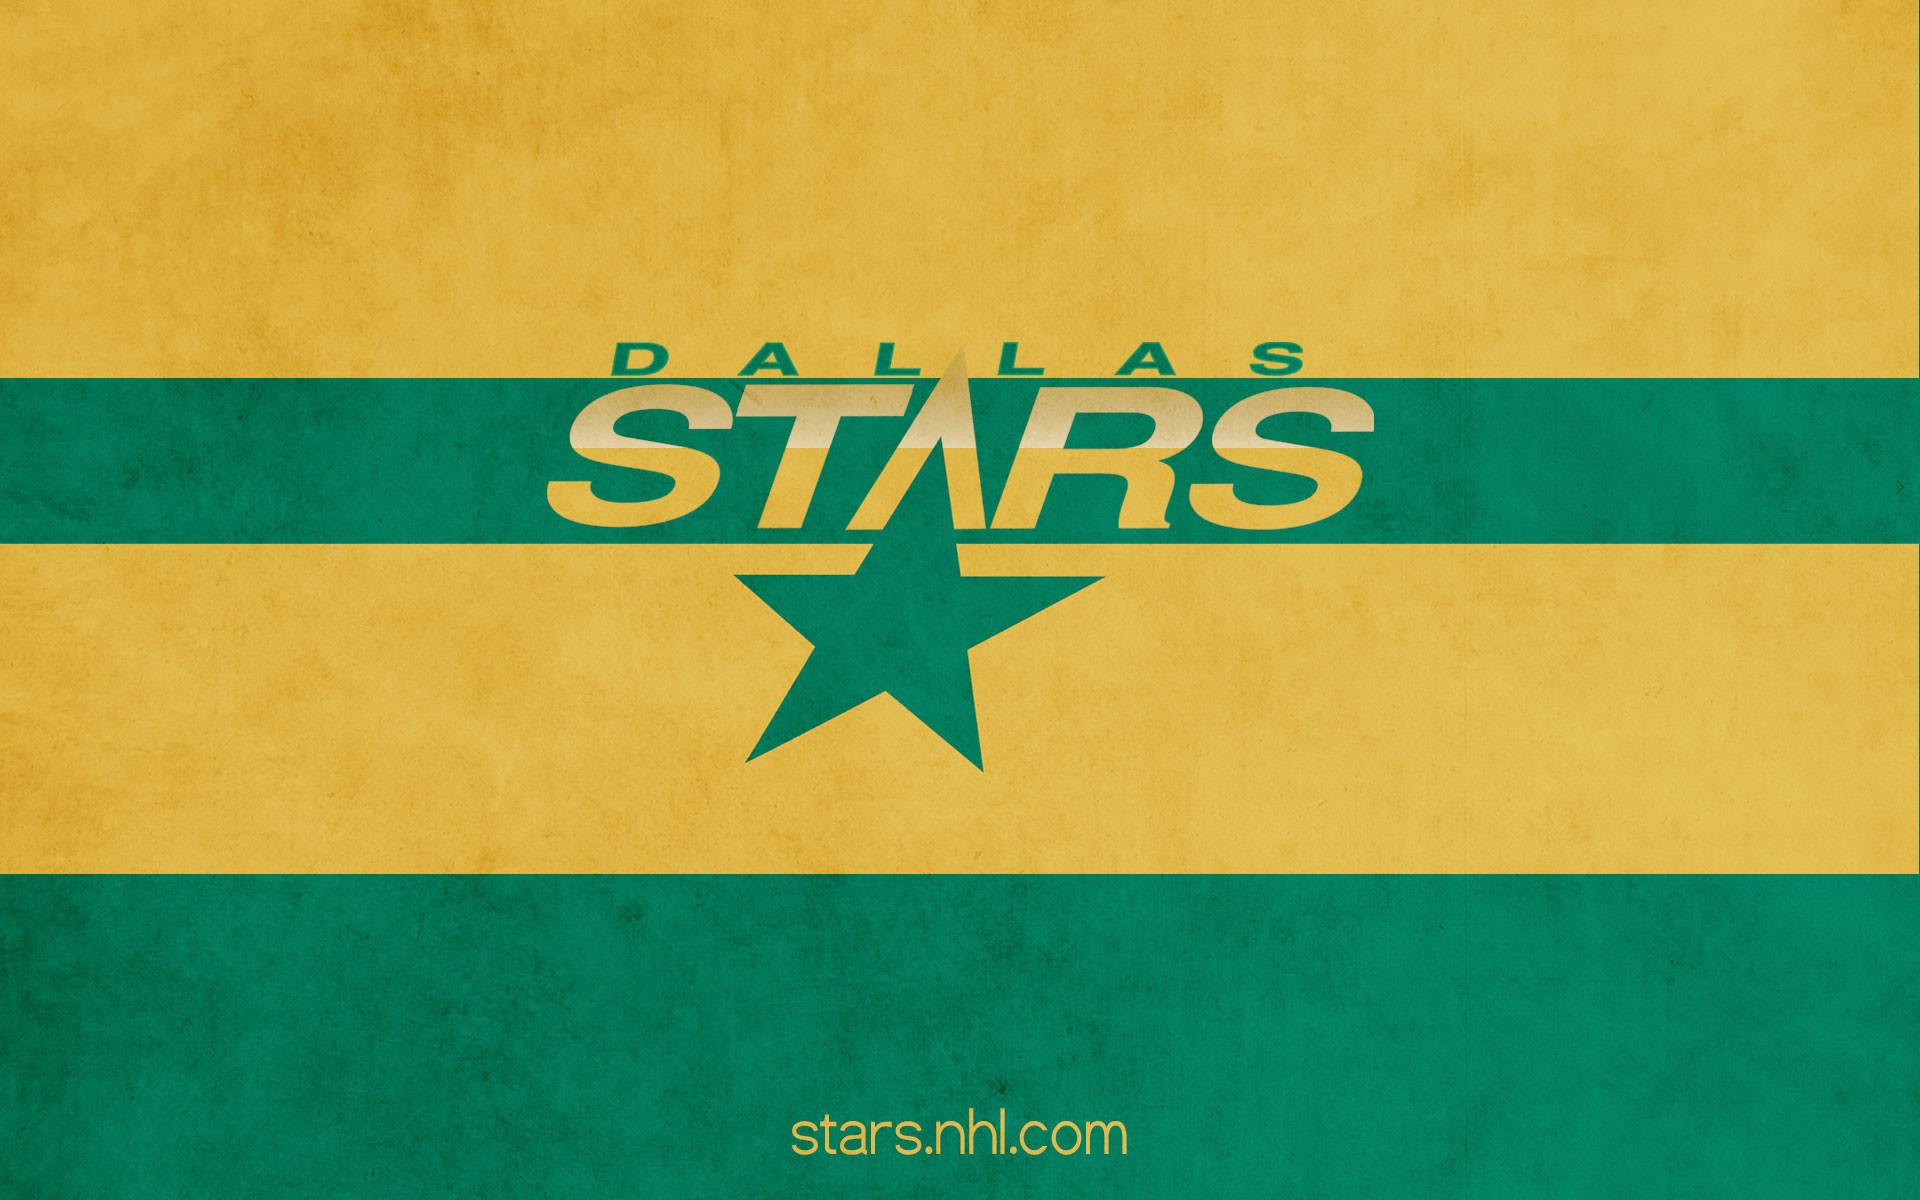 NHL Wallpapers – Dallas Stars Logo 2910×1200 wallpaper